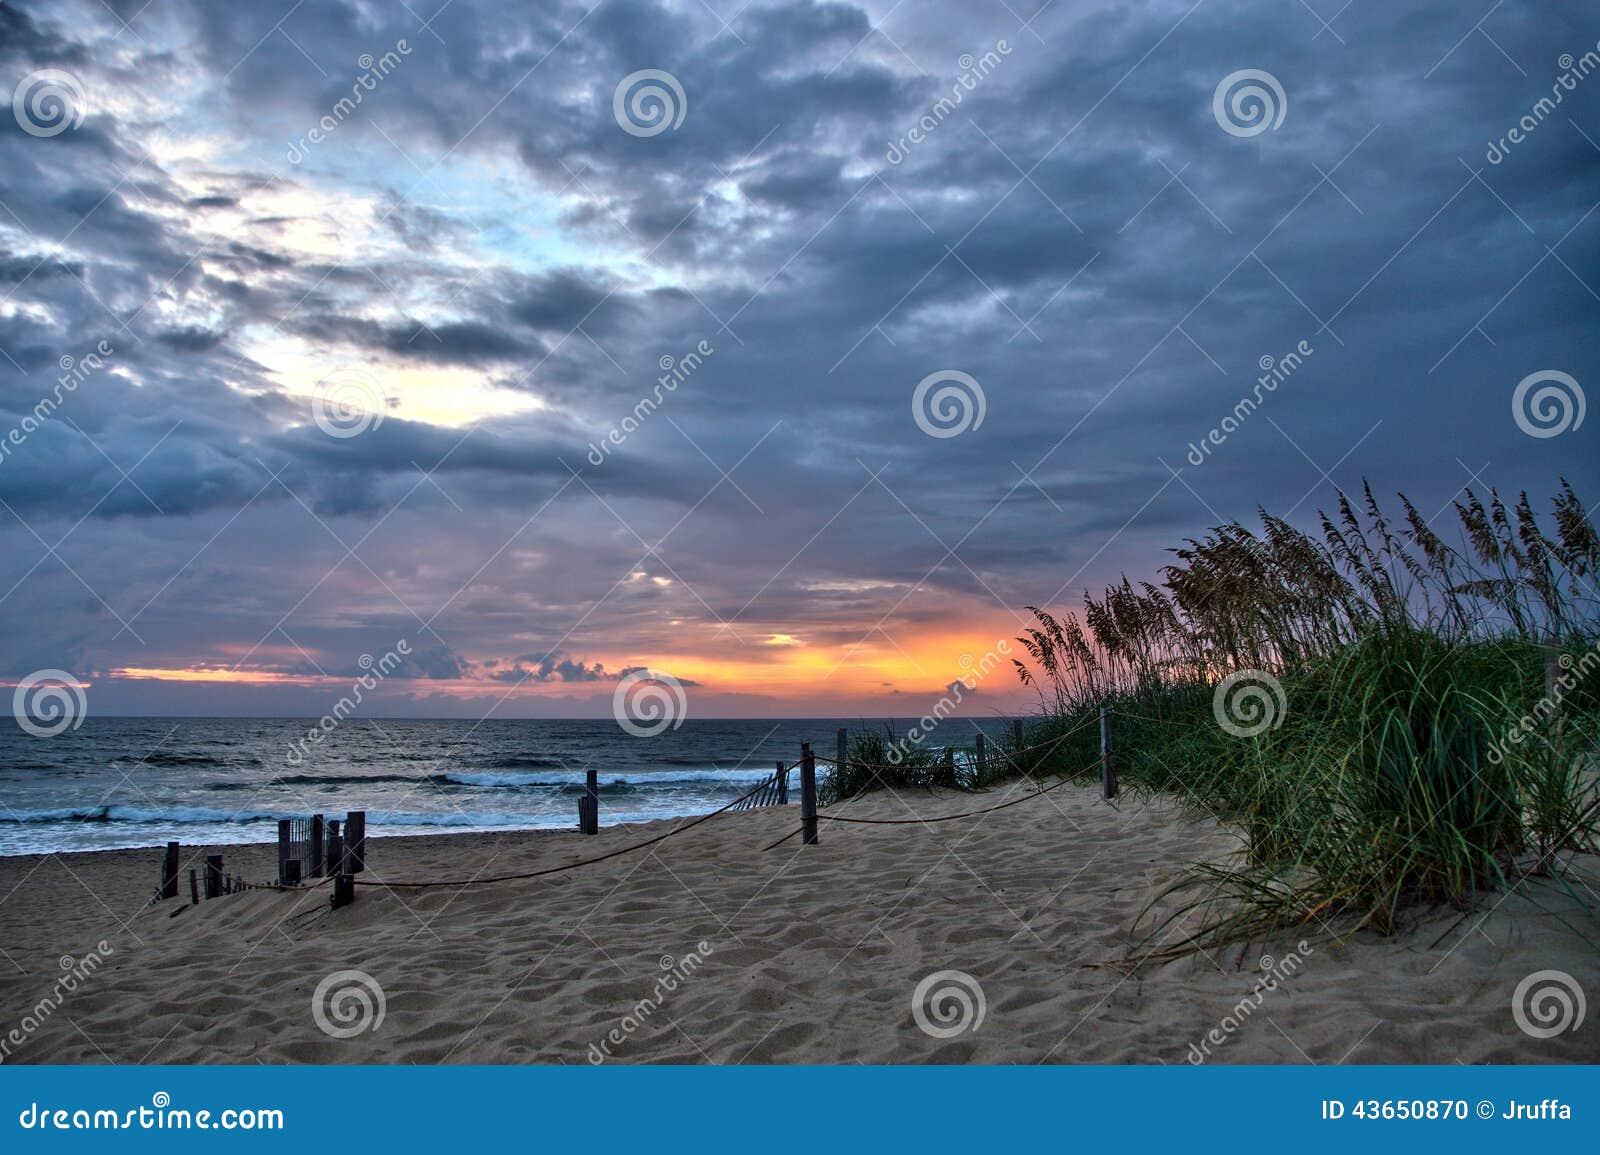 Onweerswolken bij strandzonsopgang